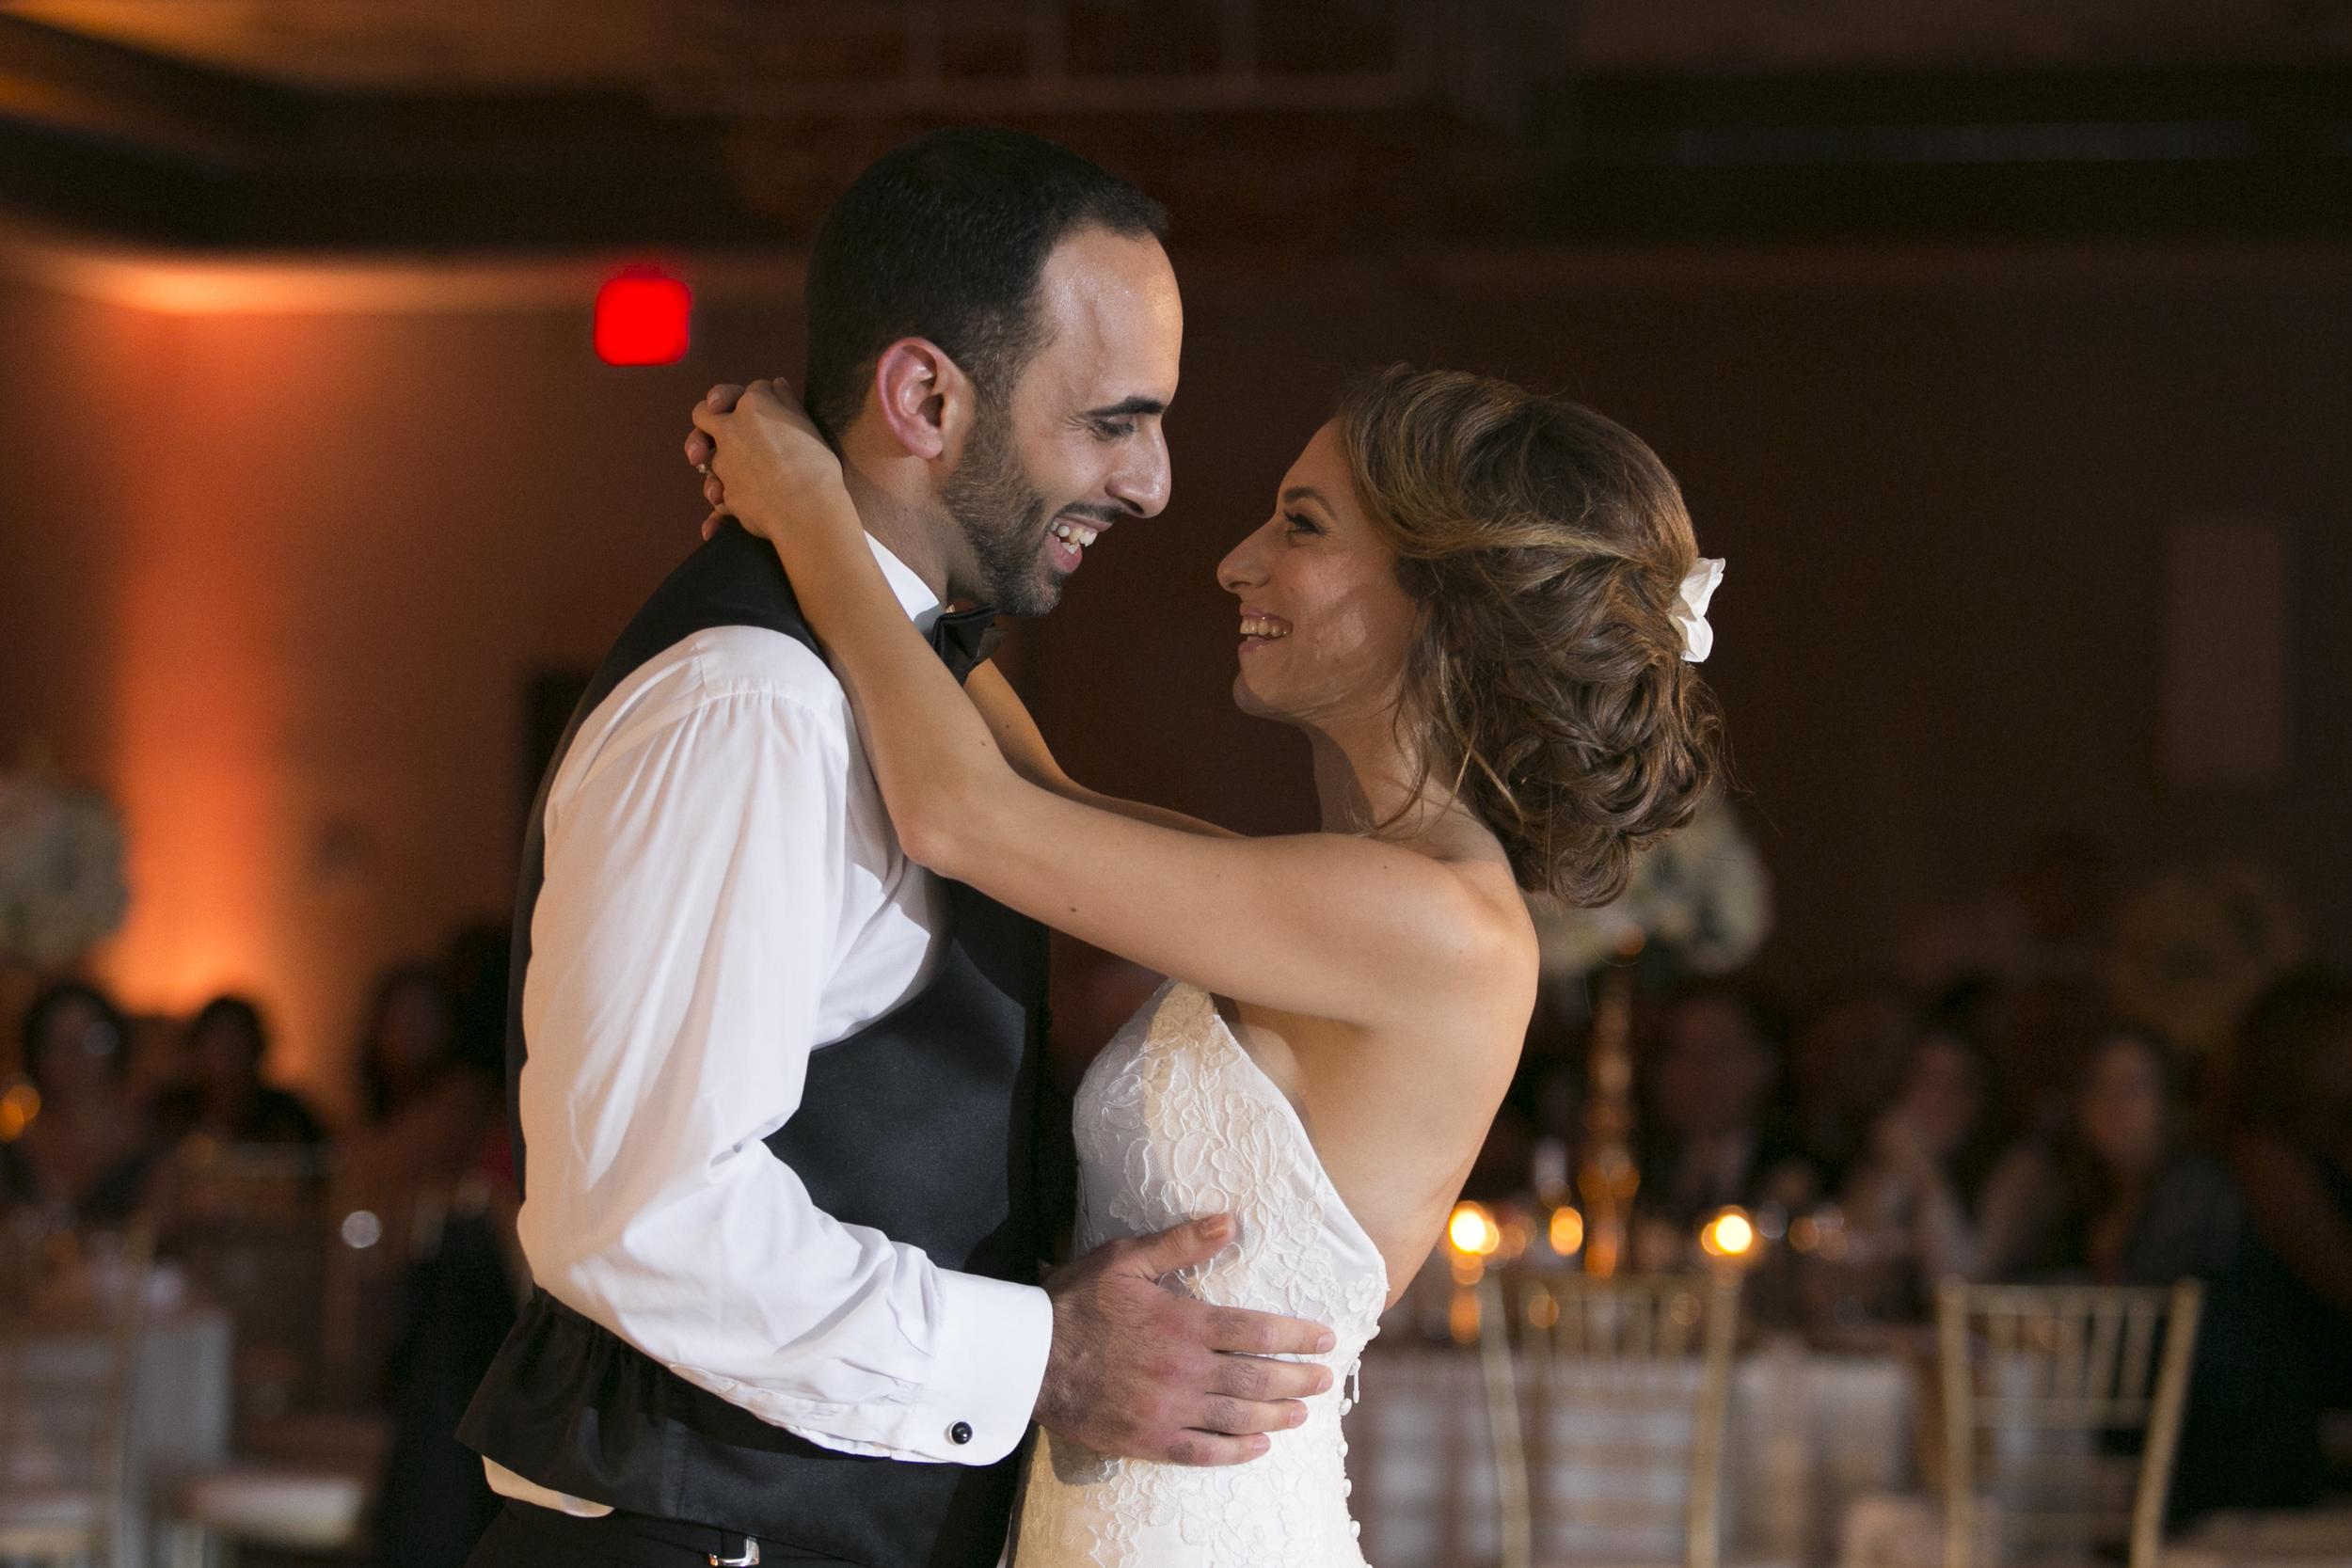 Persian Wedding-South San Francisco-Meo Baaklini31.jpg